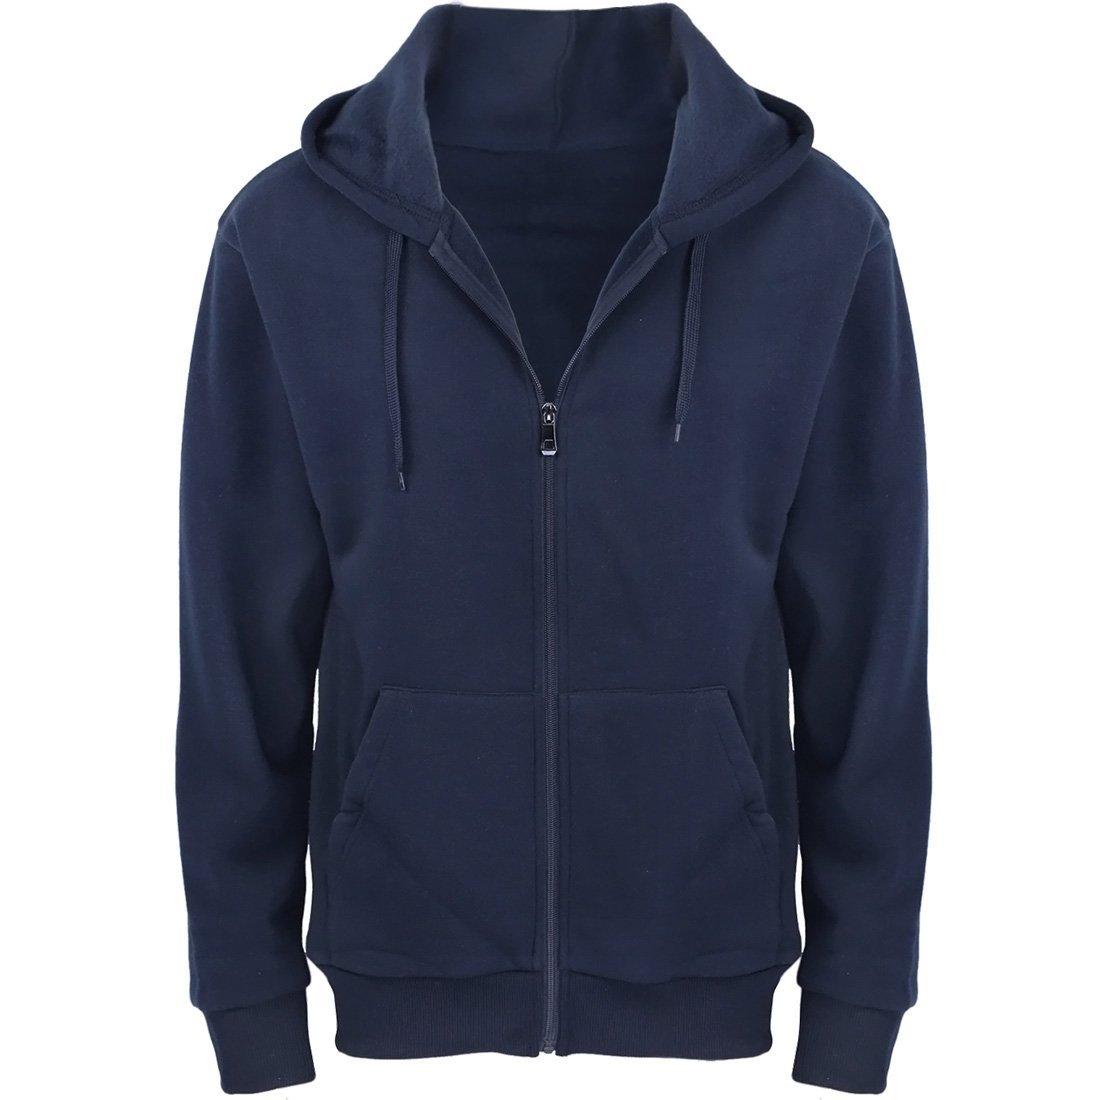 Gary Com Hoodies Men Midweight Fleece Full Zip Autumn Outwear Long Sleeve Active Jackets Sports Sweatshirts Big Tall